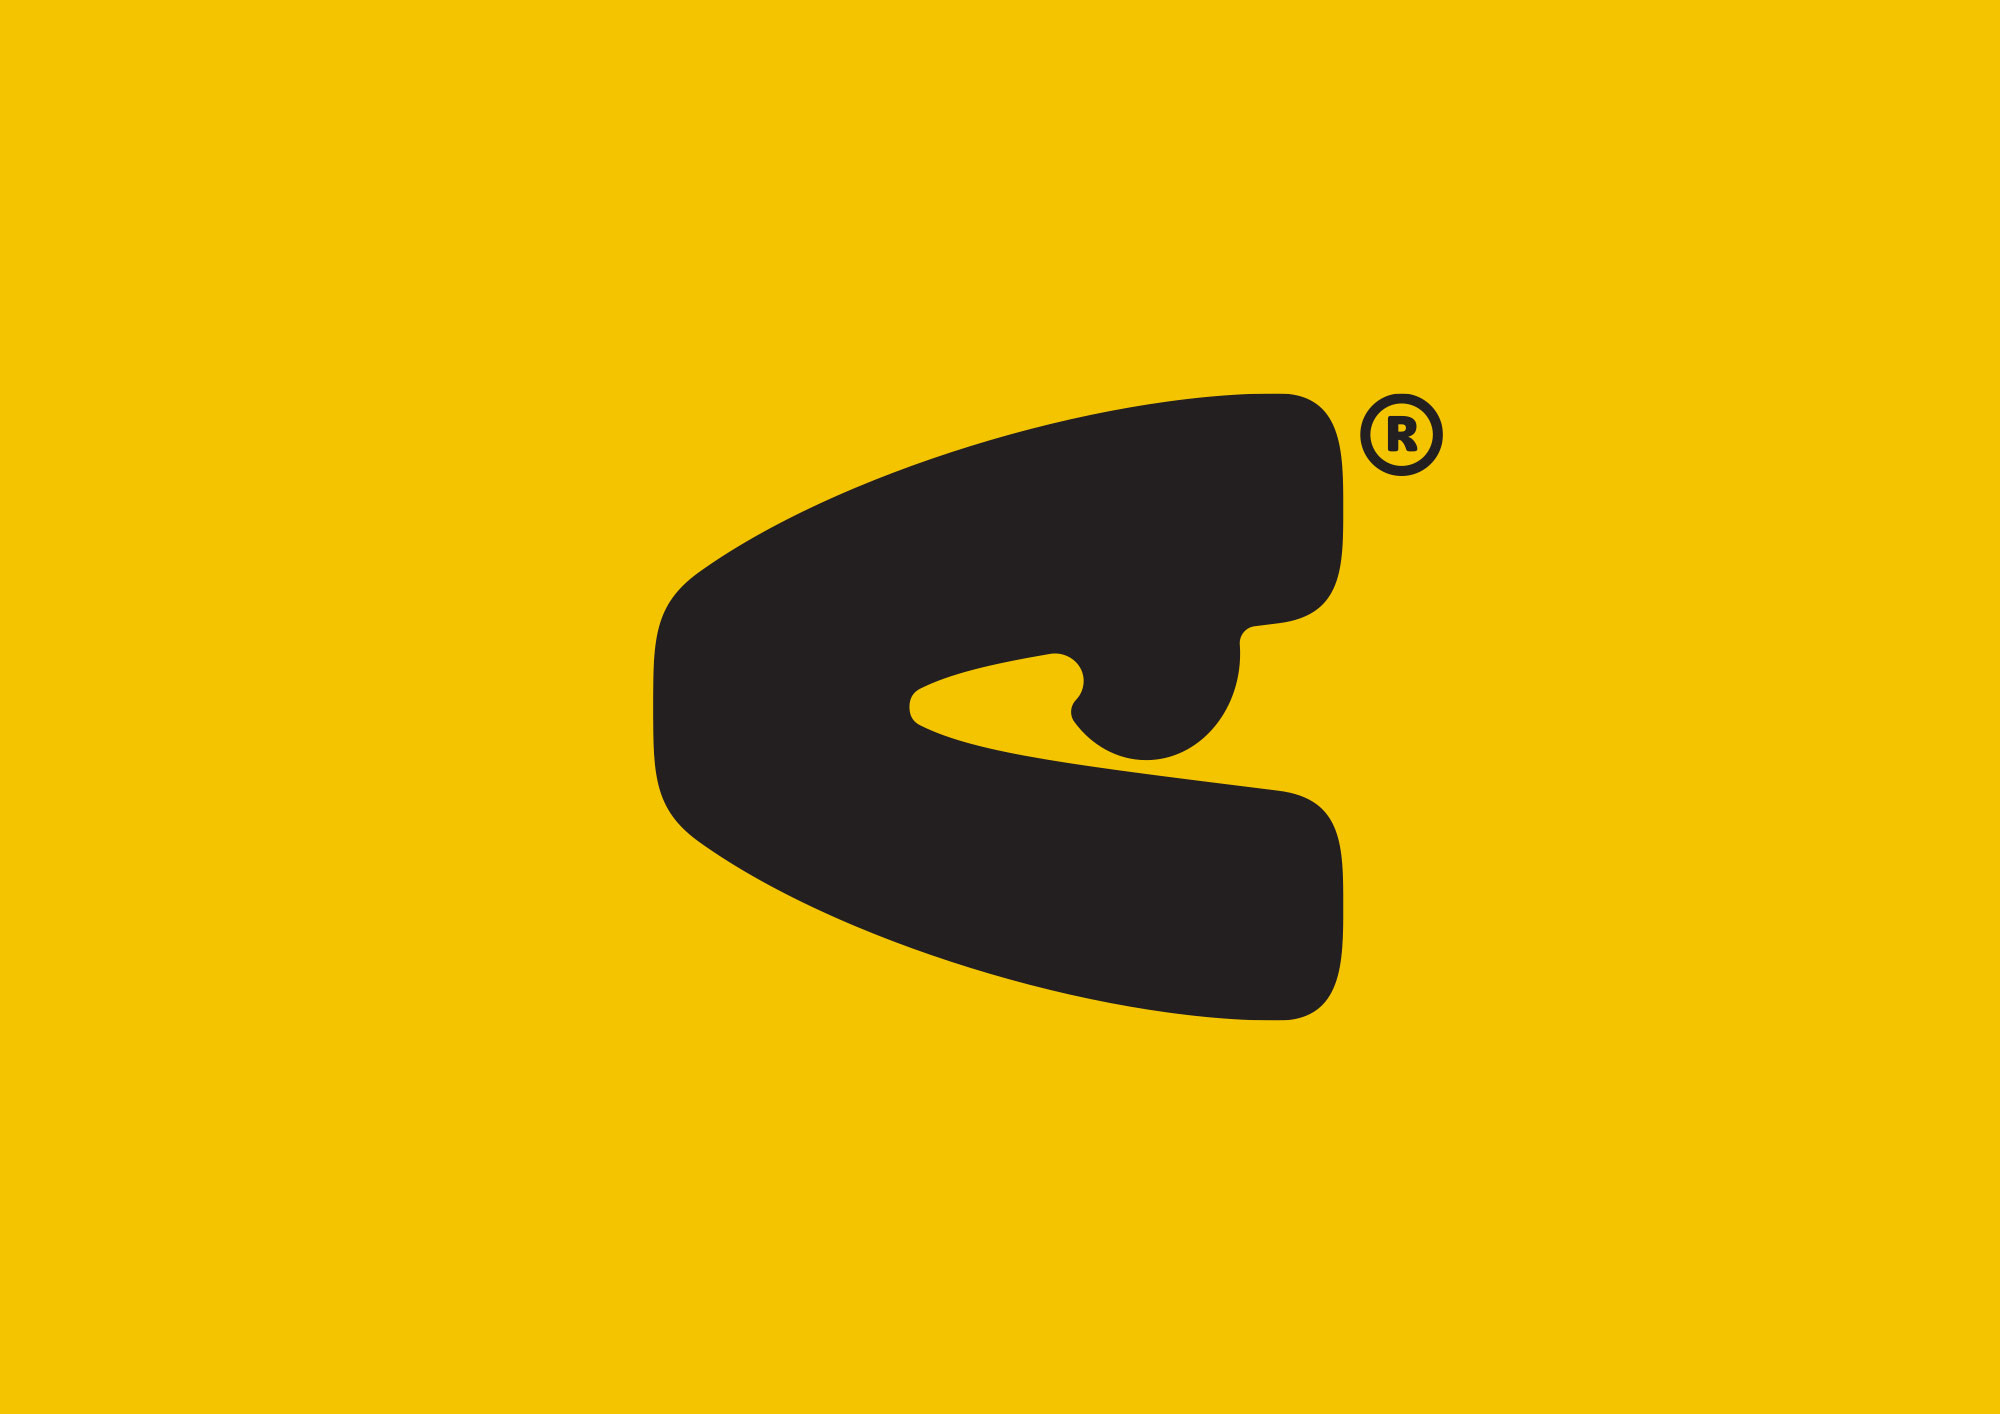 Identity design for EYEYAH! Secondary logo variation - All seeing eye.